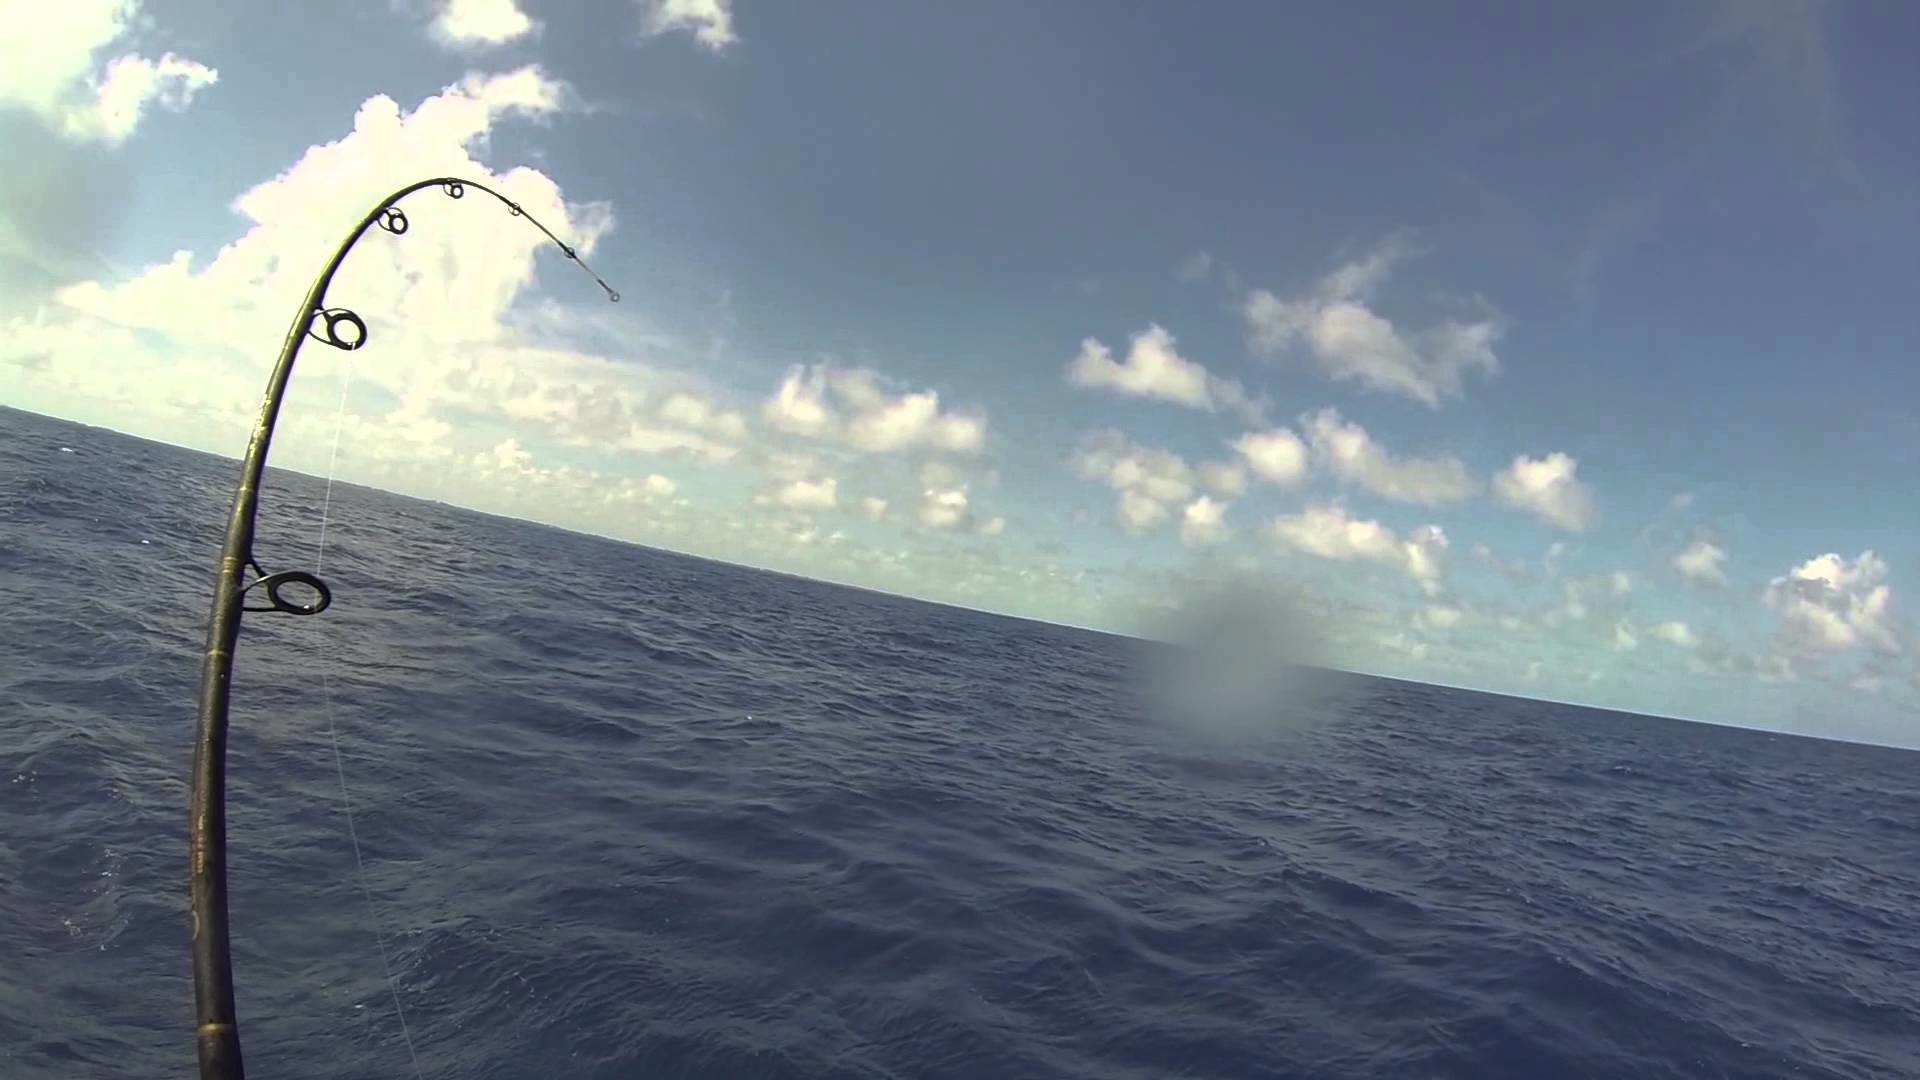 GoPro Saltwater fishing for Sailfish in Islamorada Florida